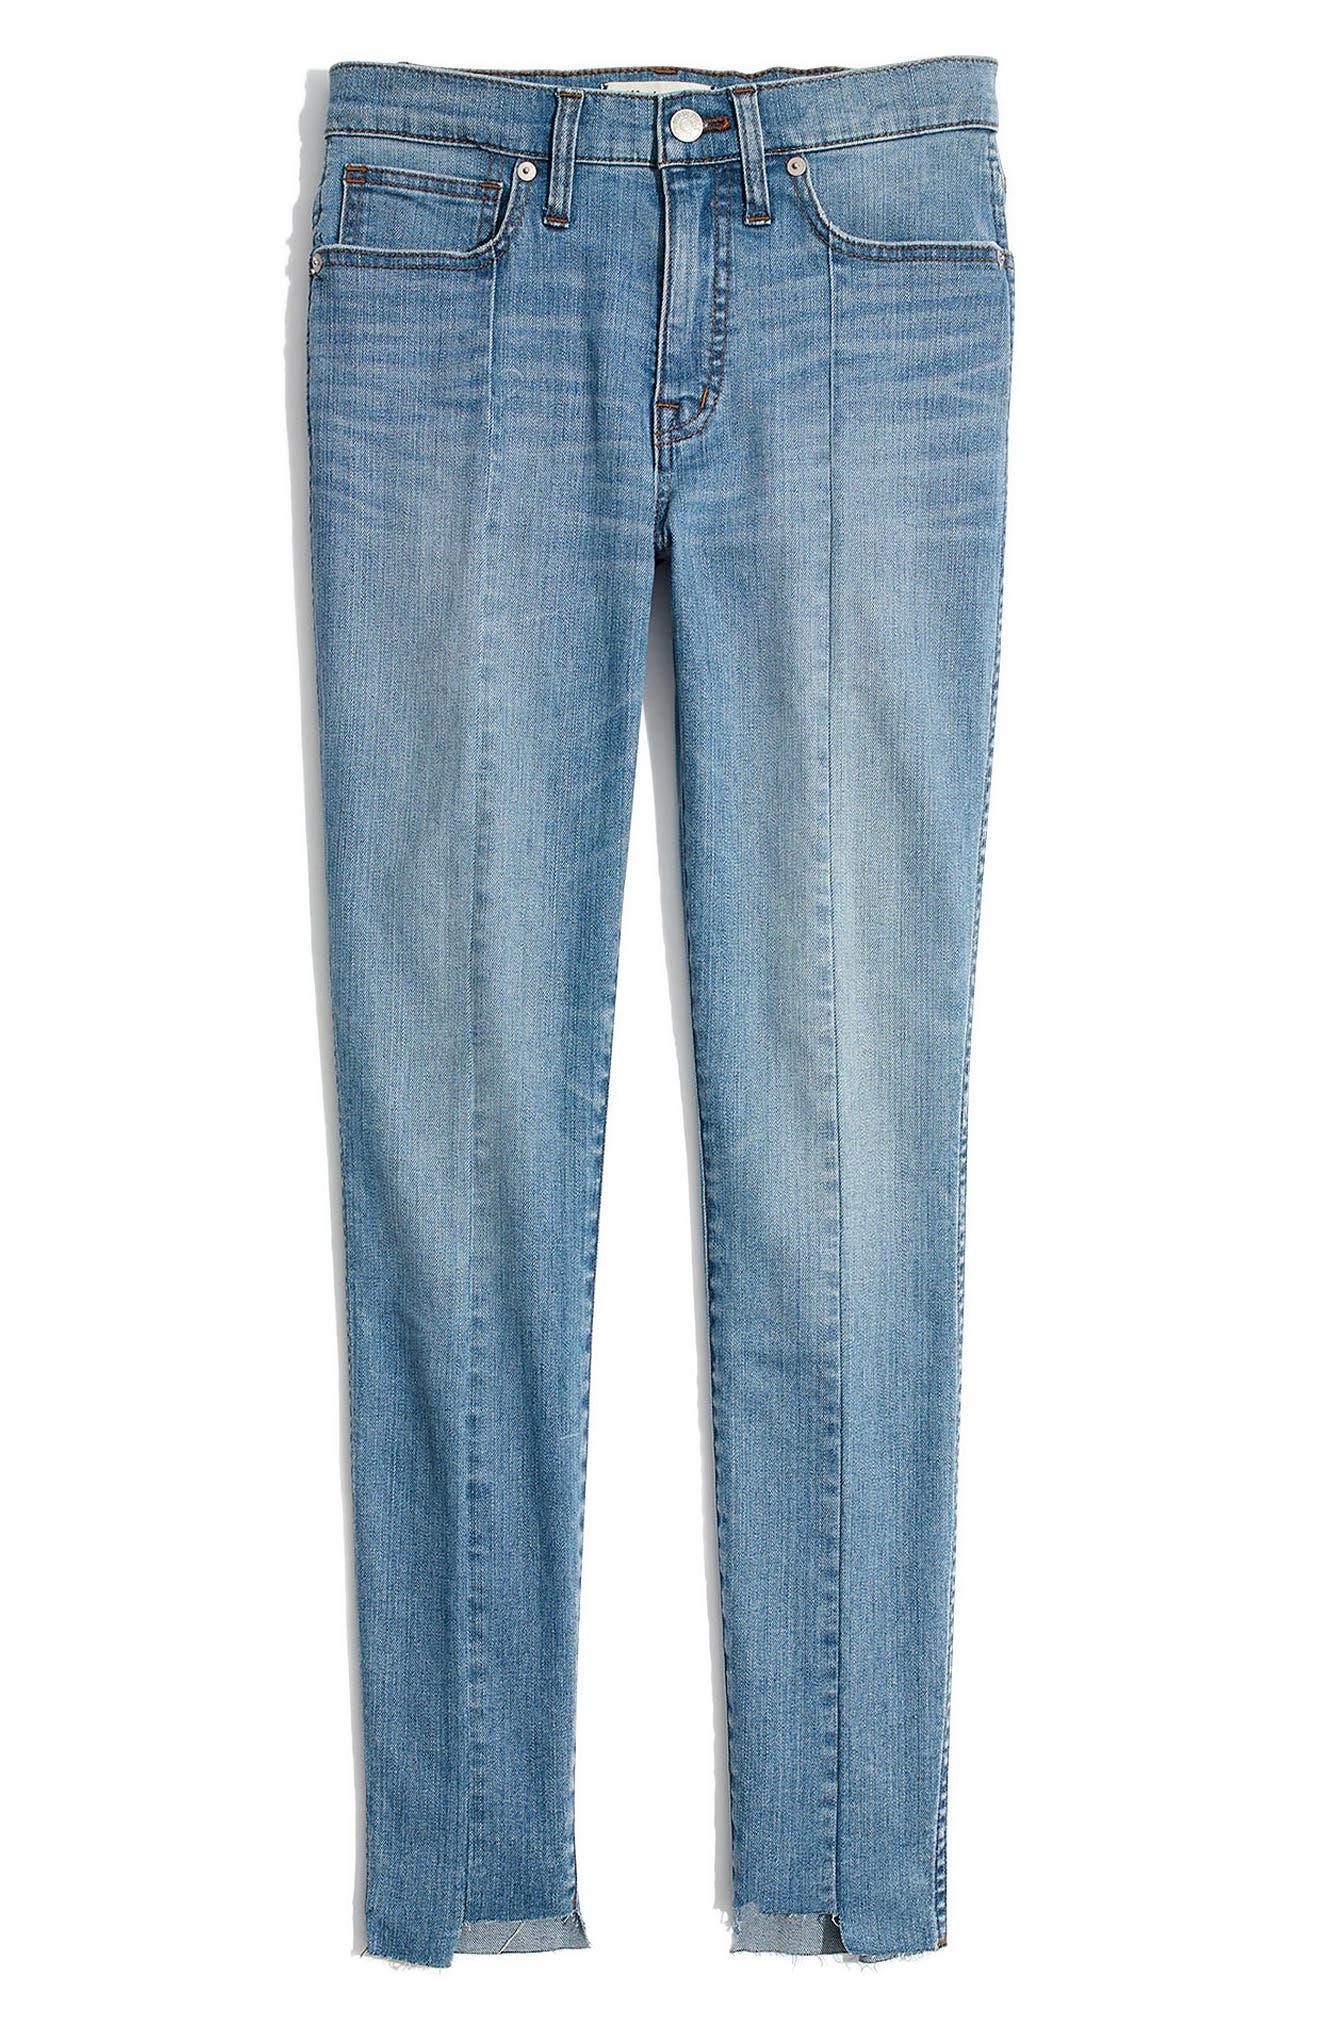 MADEWELL, 9-Inch High Waist Seamed Step-Hem Edition Skinny Jeans, Alternate thumbnail 4, color, 400